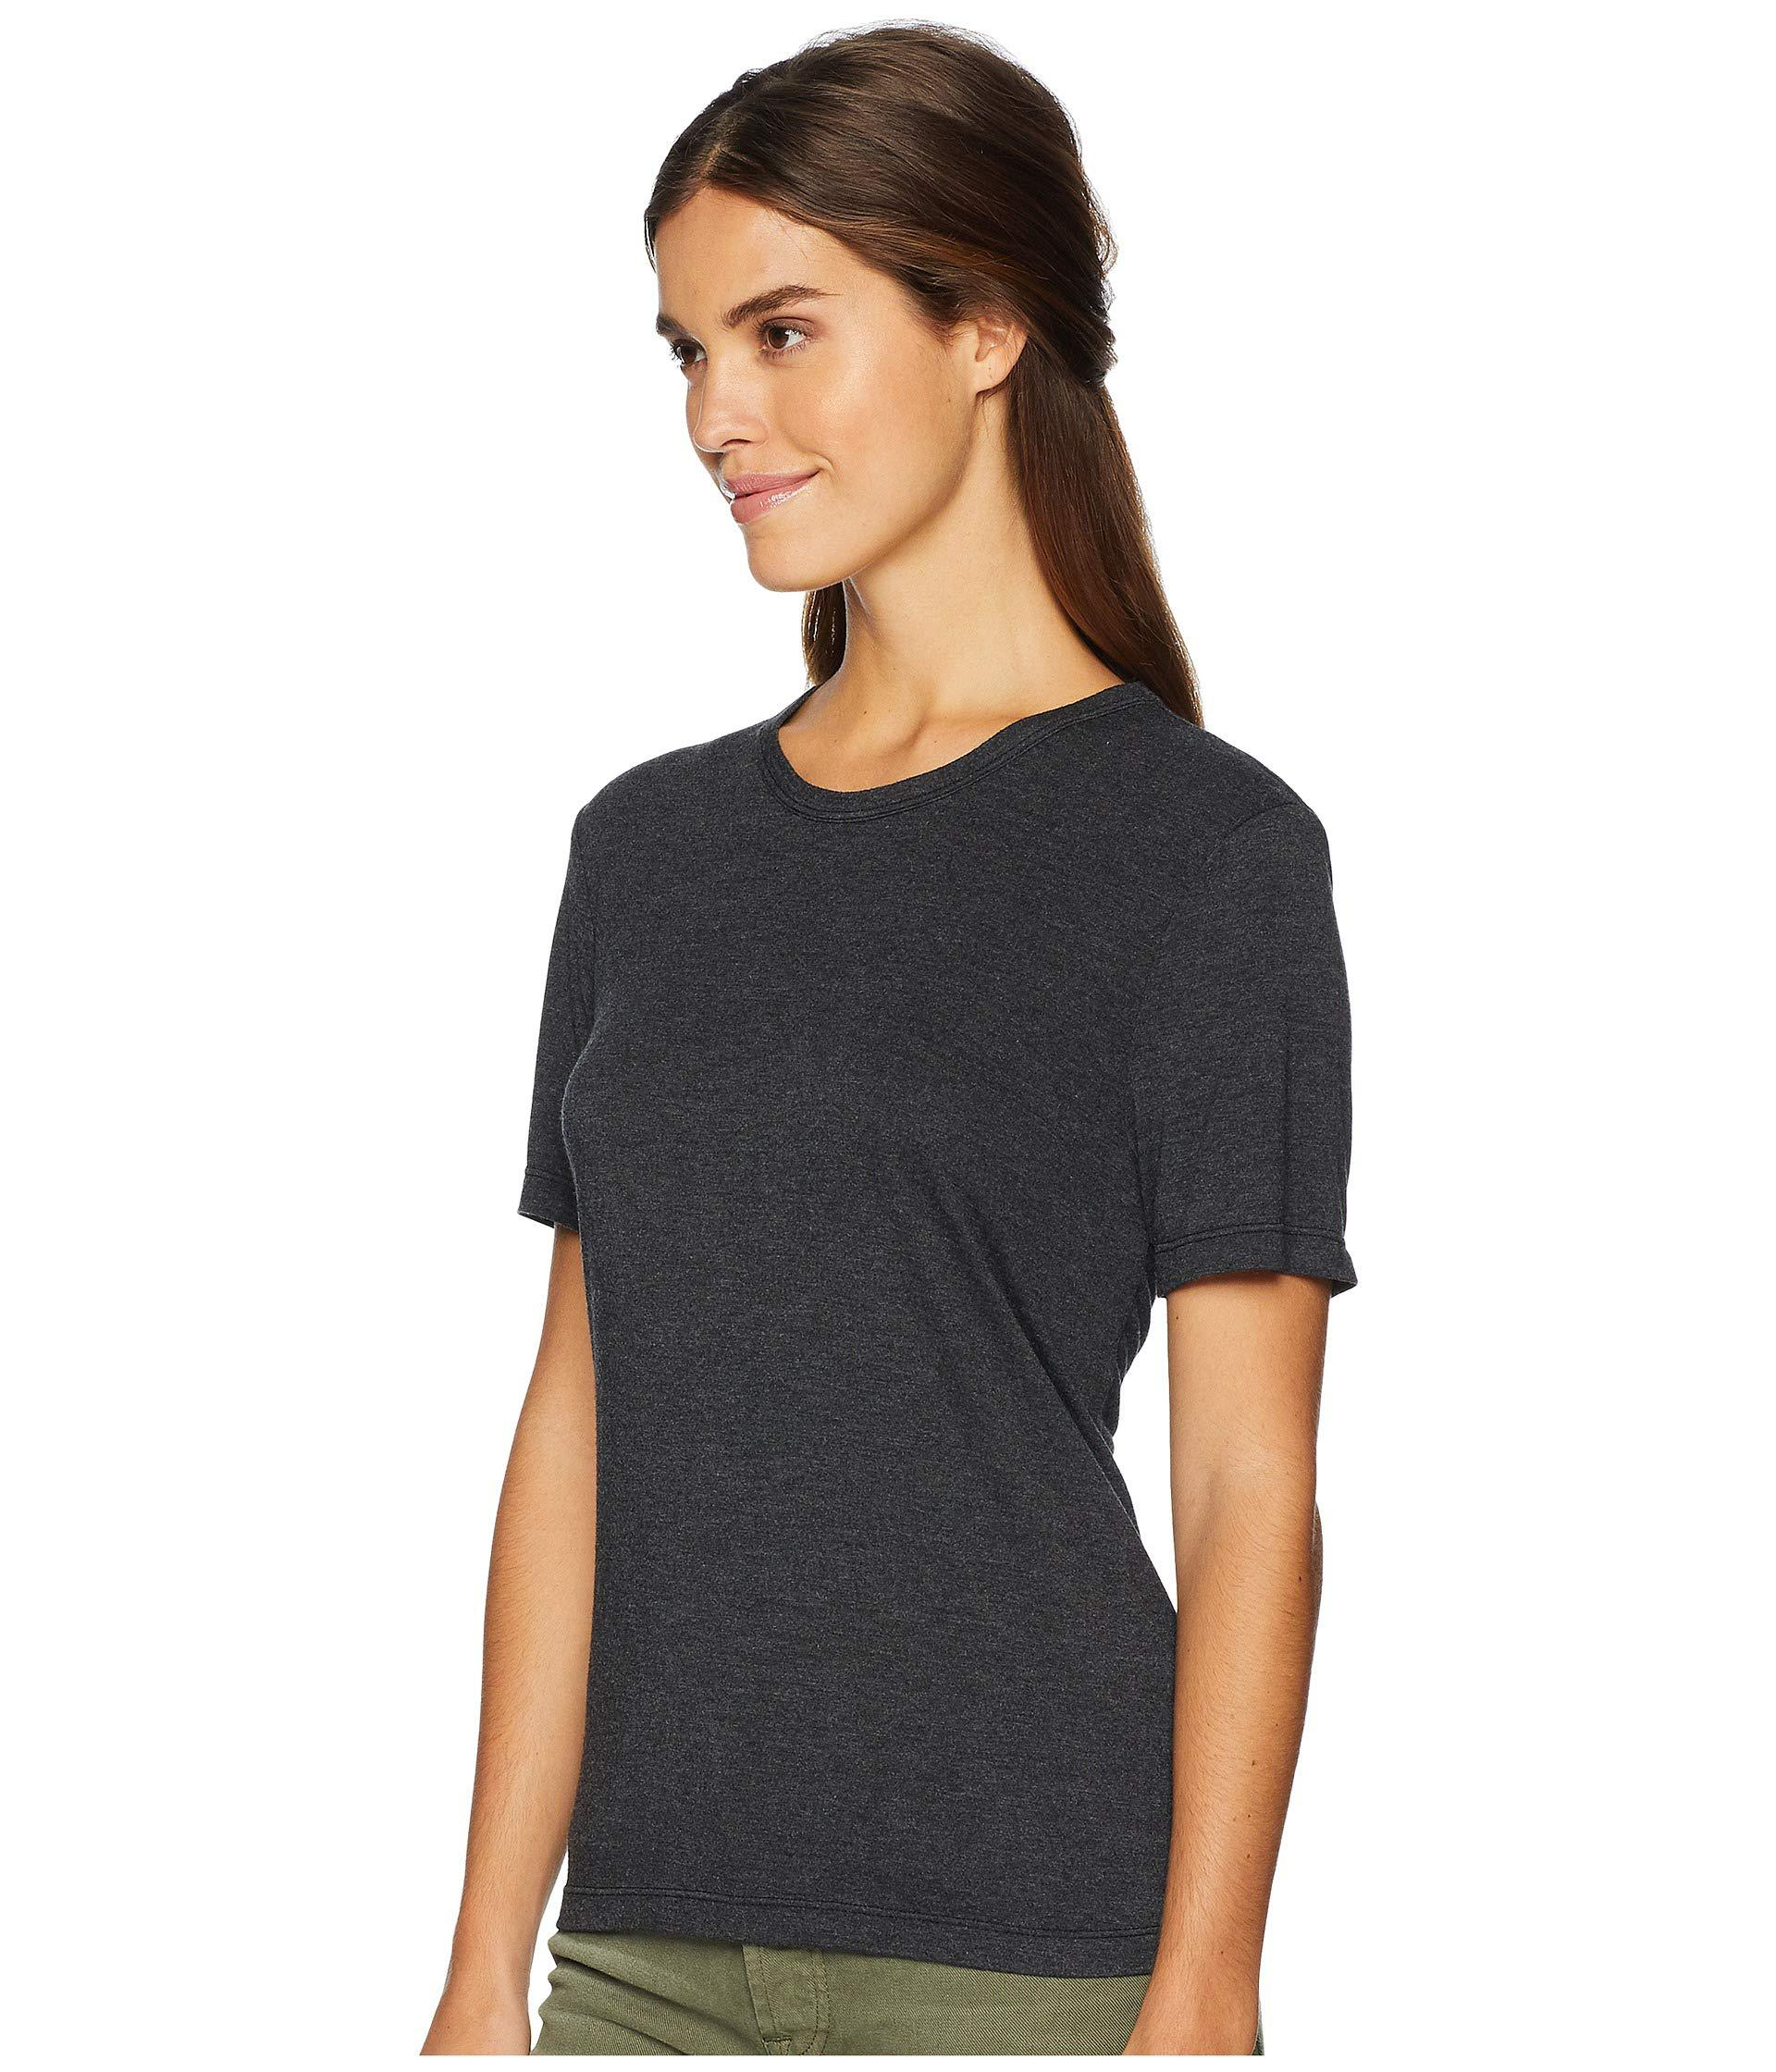 Lyst - Michael Stars Brixton Jersey Short Sleeve Crew Neck (black) Women s  Clothing in Black 9e4944f52cf